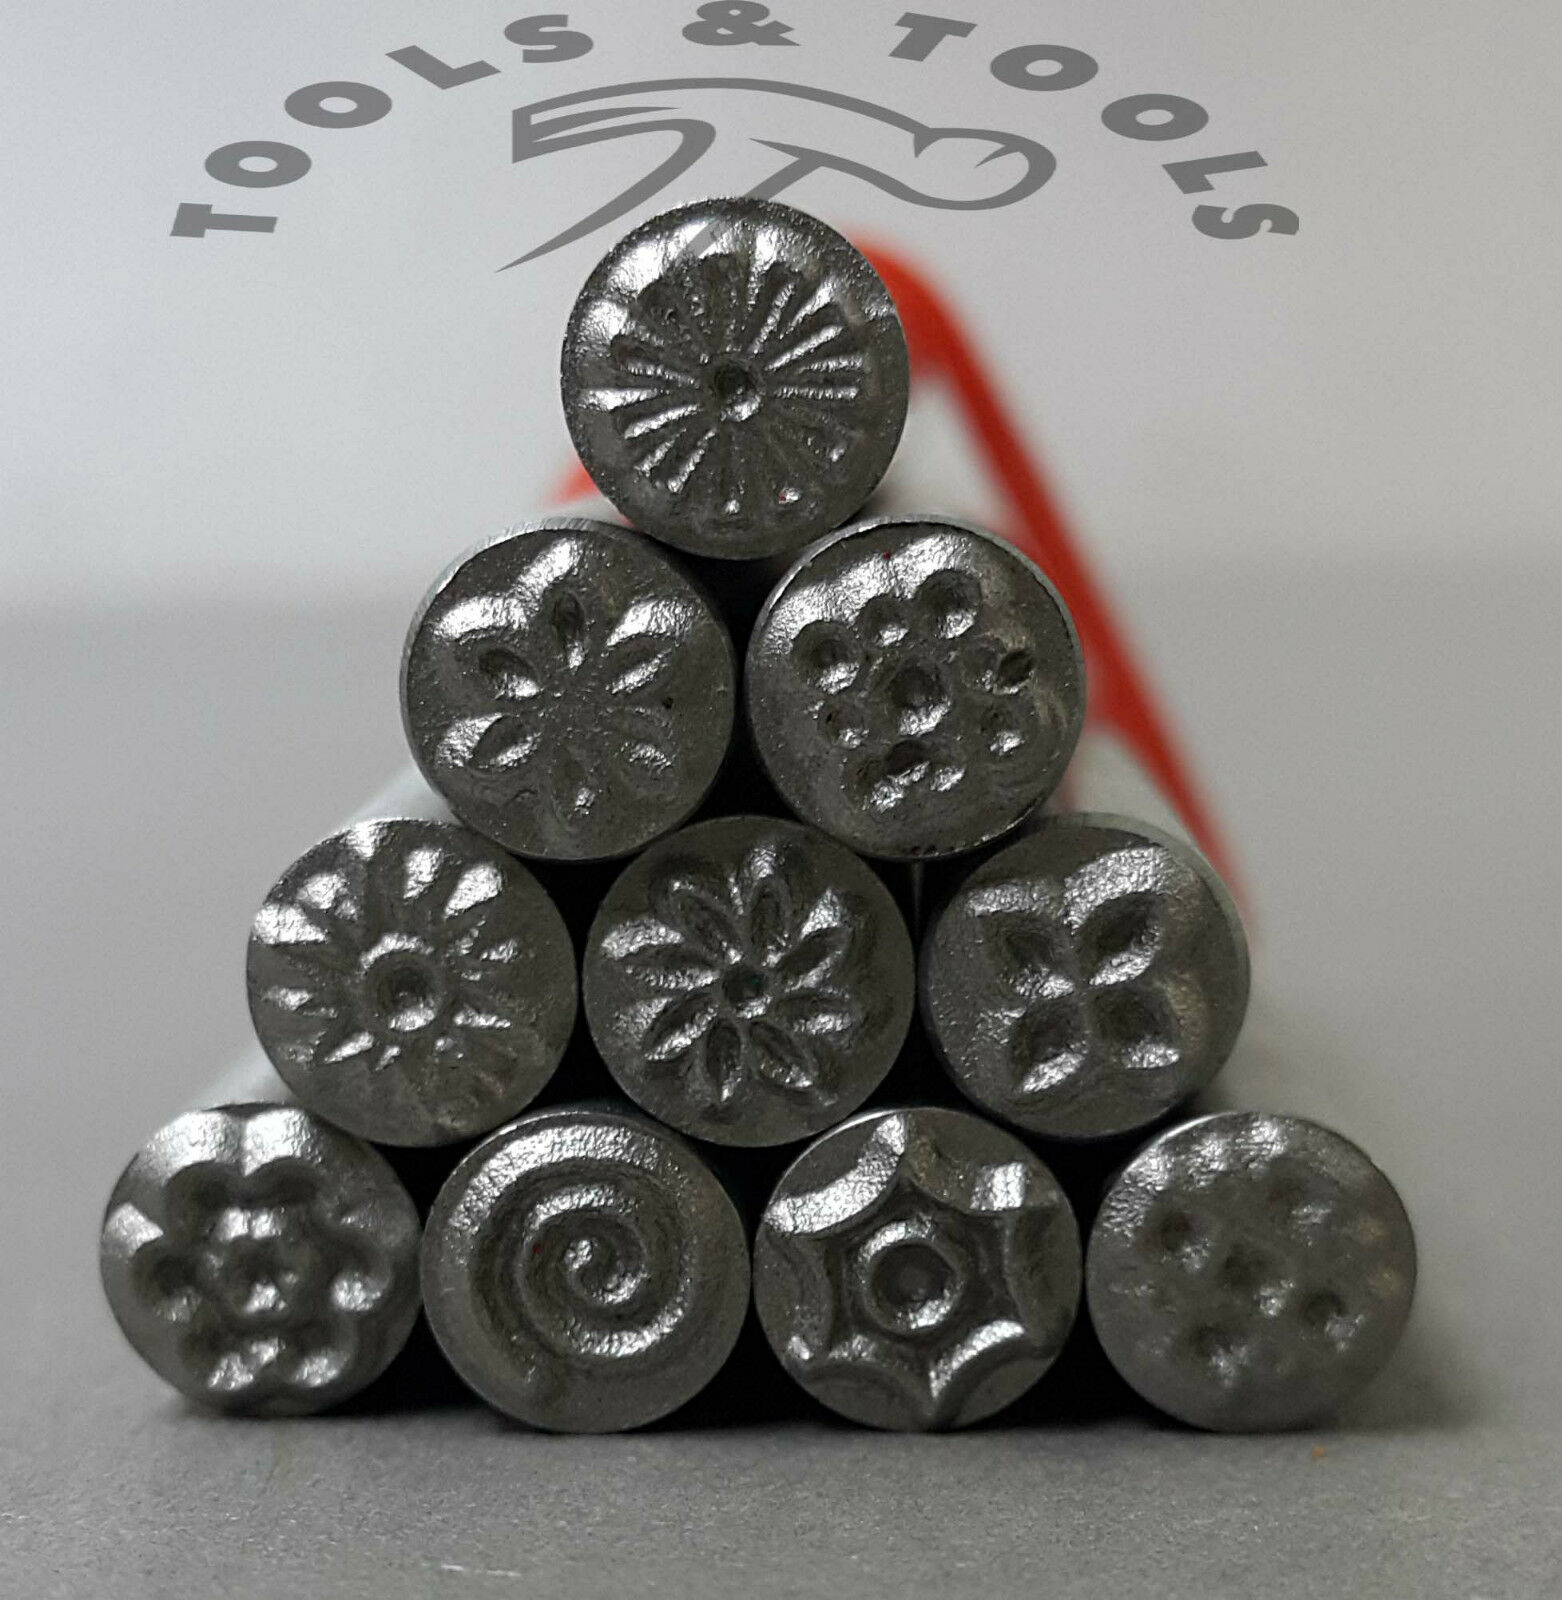 5 Mm Various Floral Patterns Precision Design Metal Punch